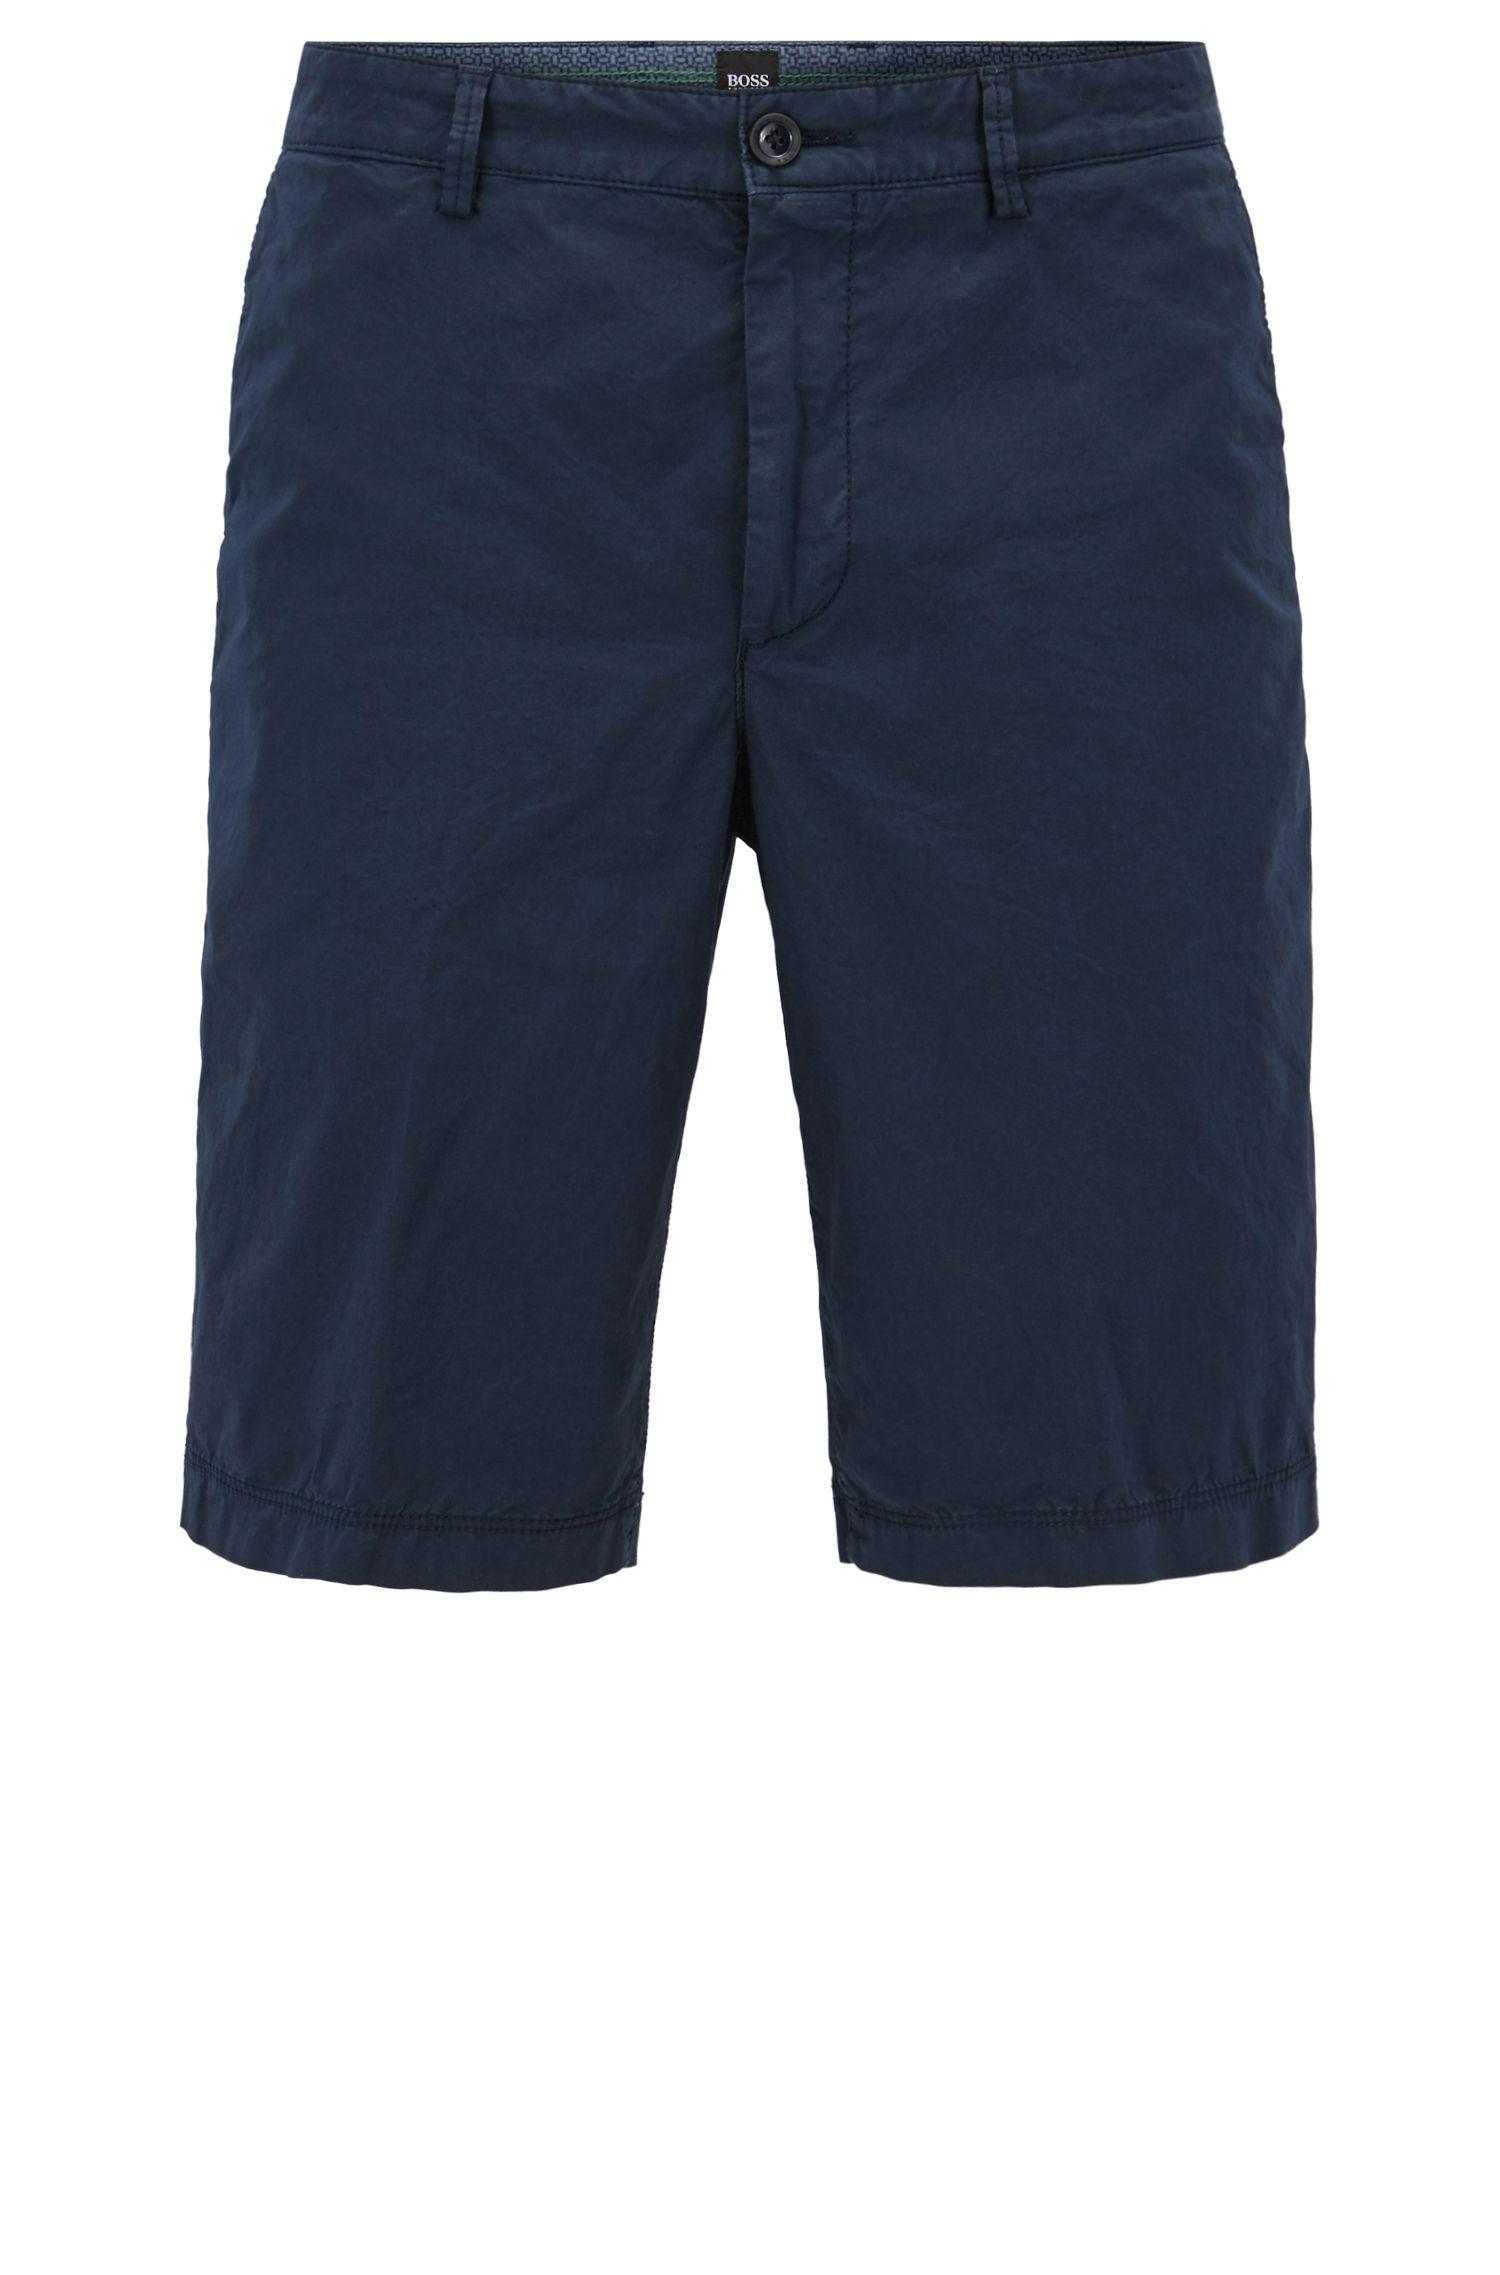 Shorts regular fit en algodón elástico ligero